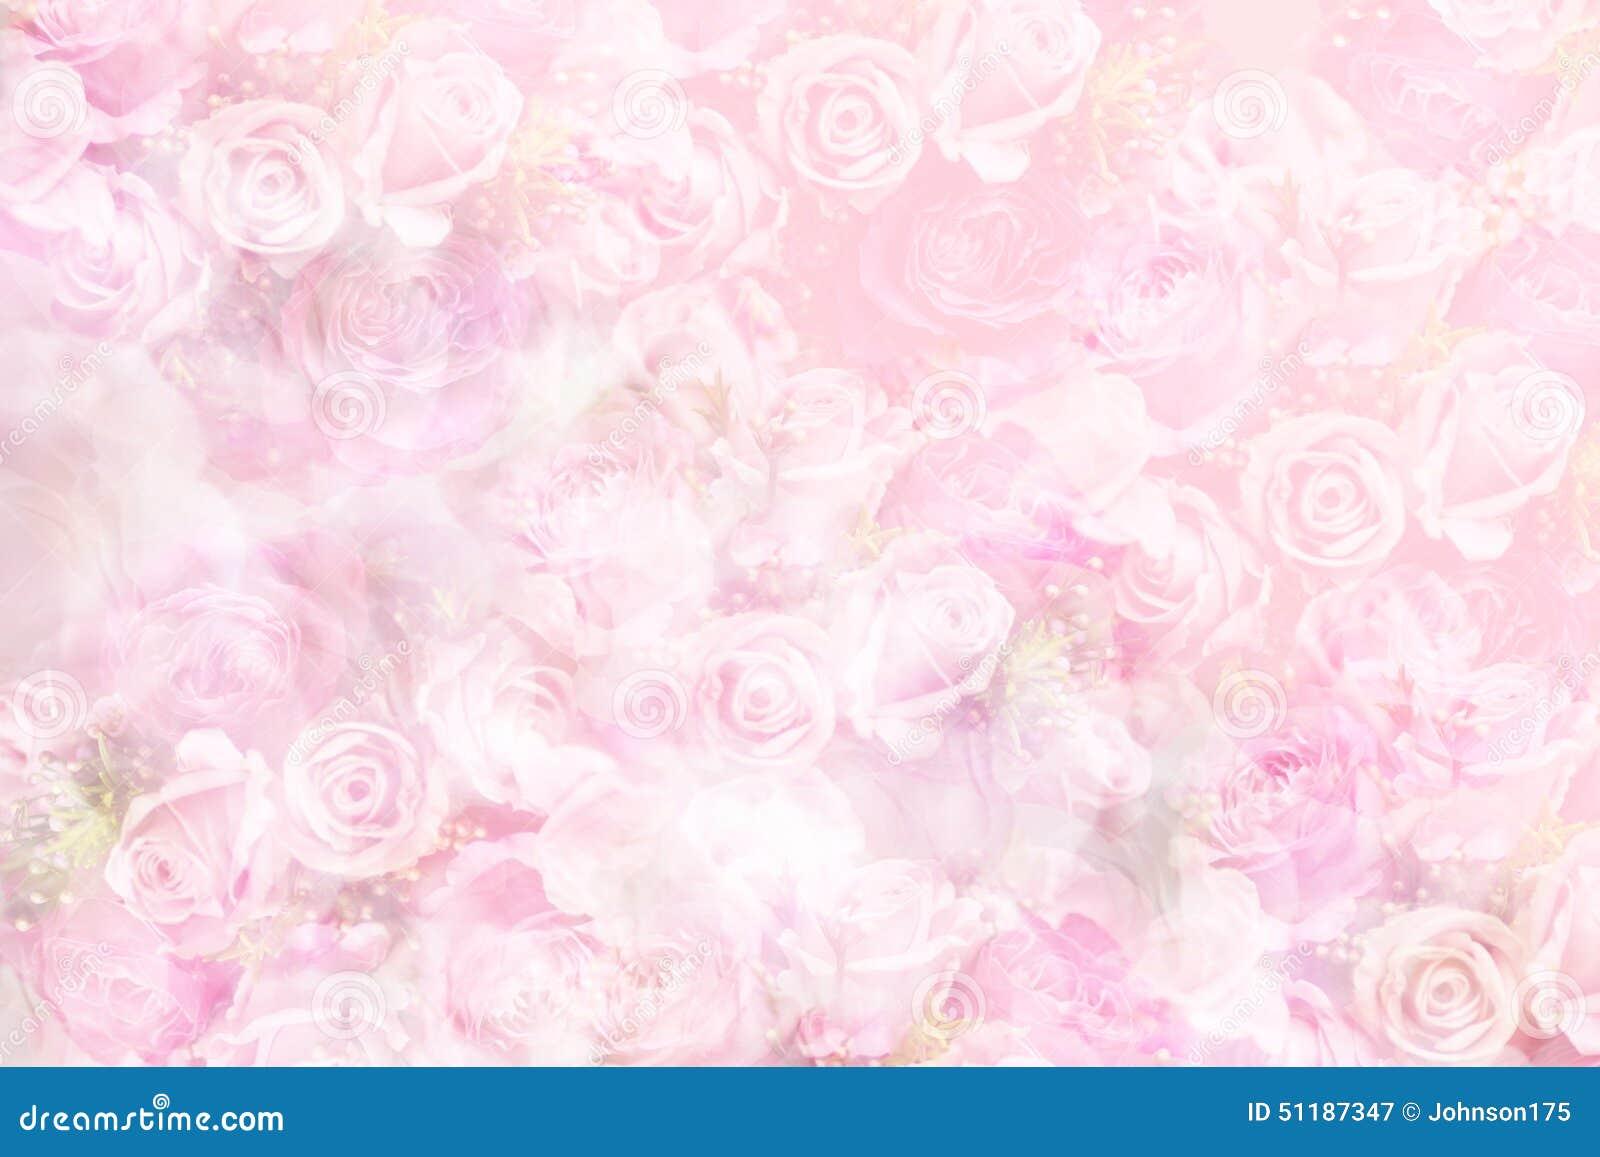 Fond Rose De Pastel Photo stock - Image: 51187347